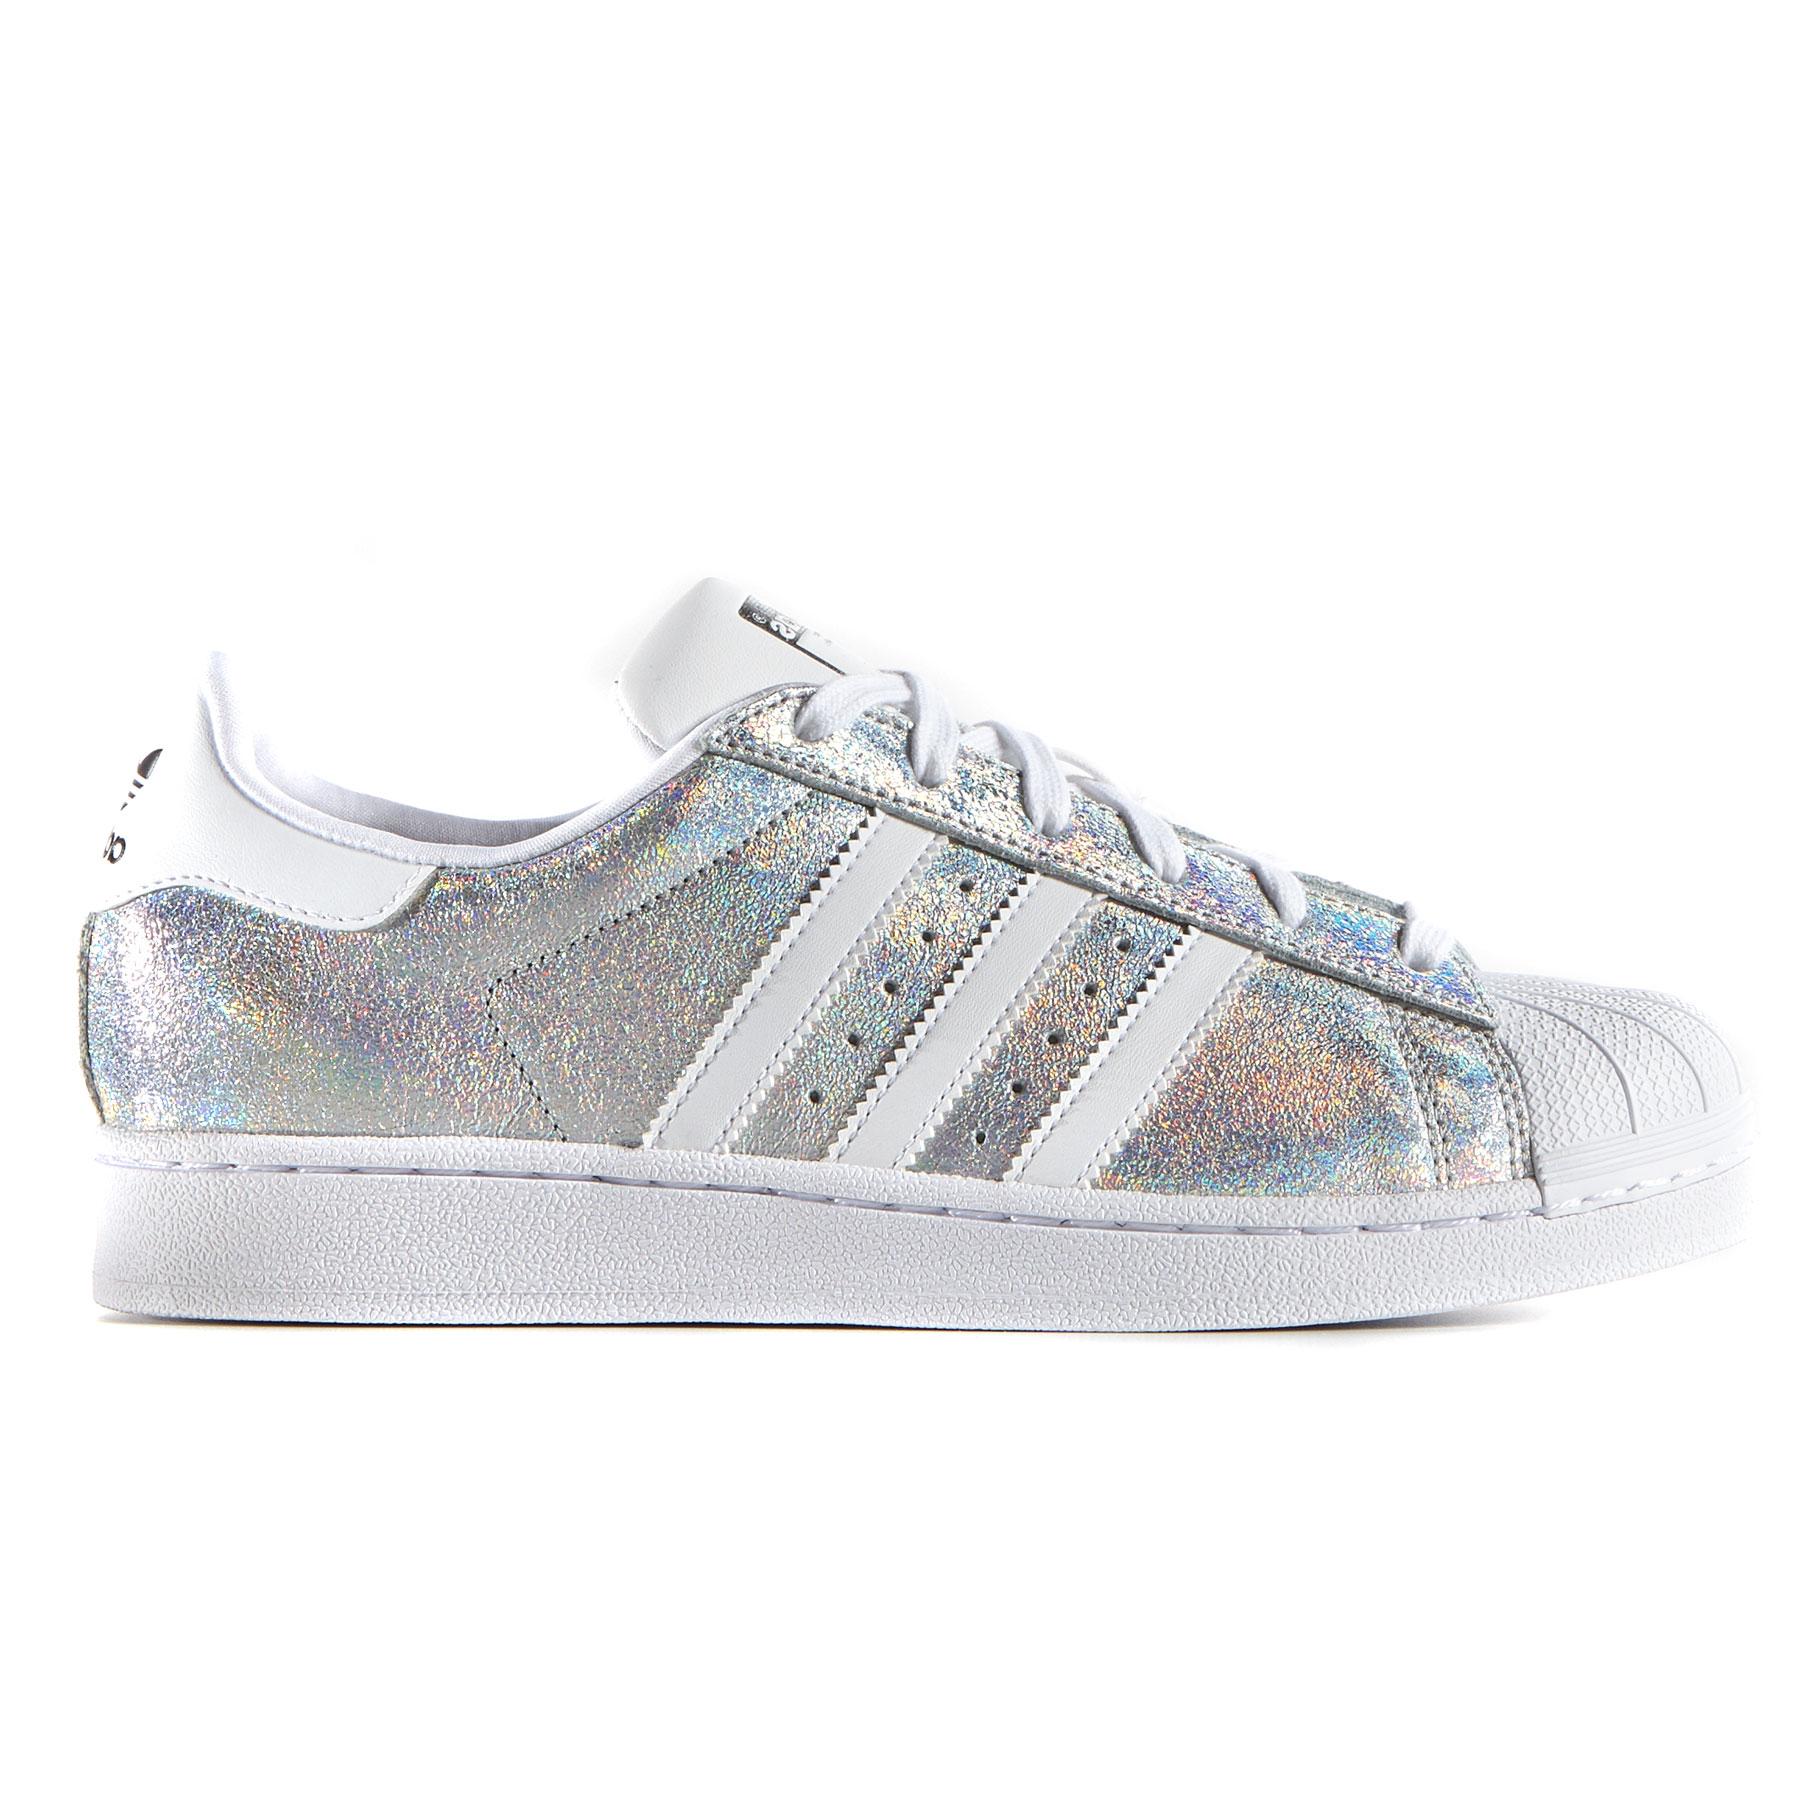 newest fed2f eb42a 030573501 silv-1. Adidas Originals Superstar Iridescent